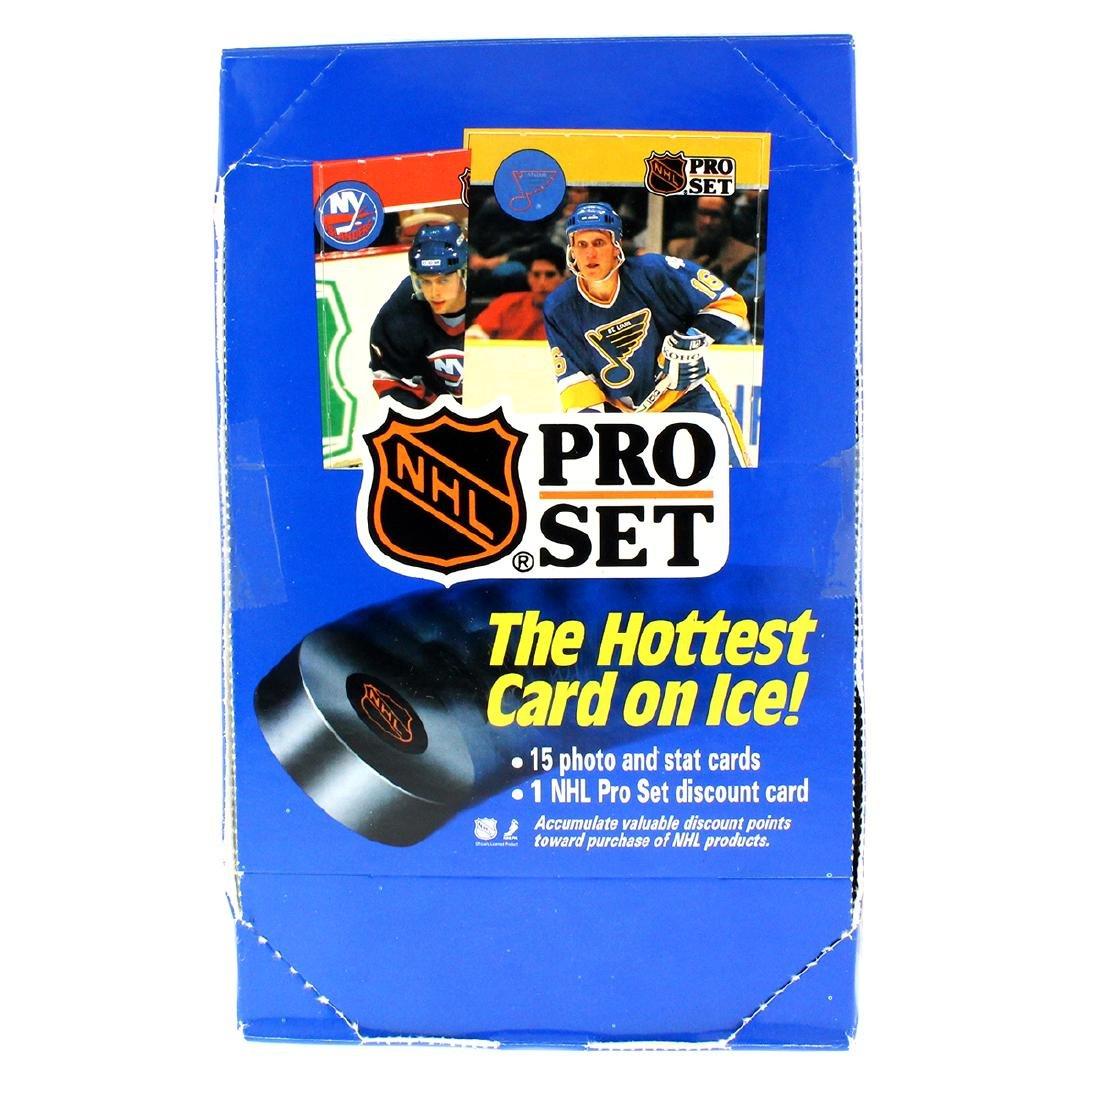 Rare 1990 Box Pro Set NHL Cards Over 500 Cards Per Box